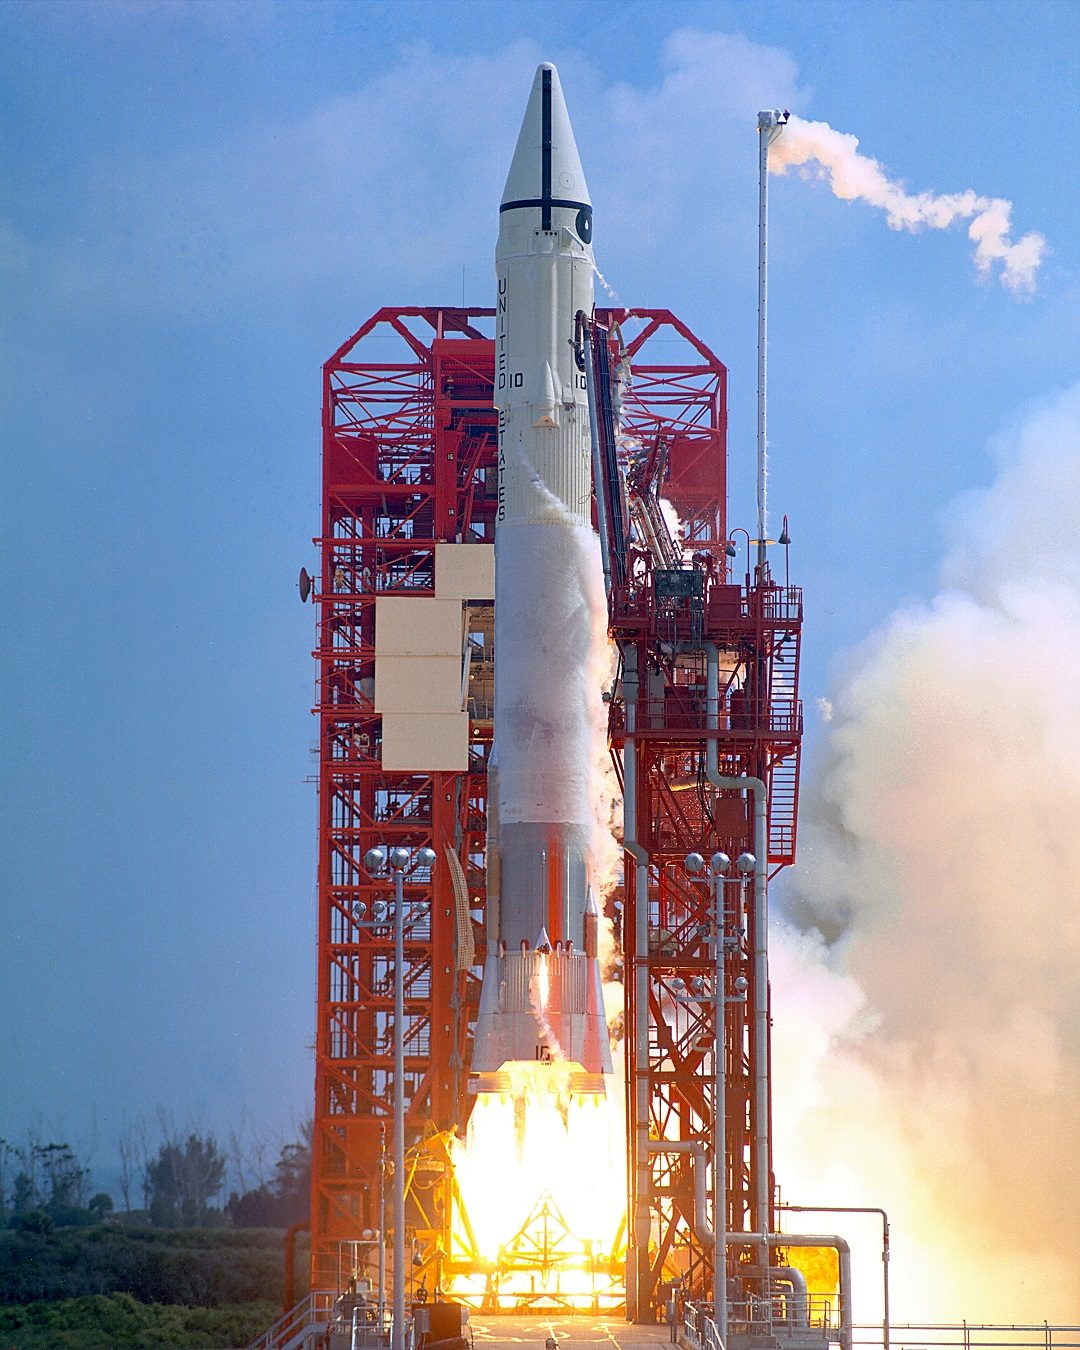 https://upload.wikimedia.org/wikipedia/commons/thumb/7/72/Surveyor_1_launch.jpg/220px-Surveyor_1_launch.jpg